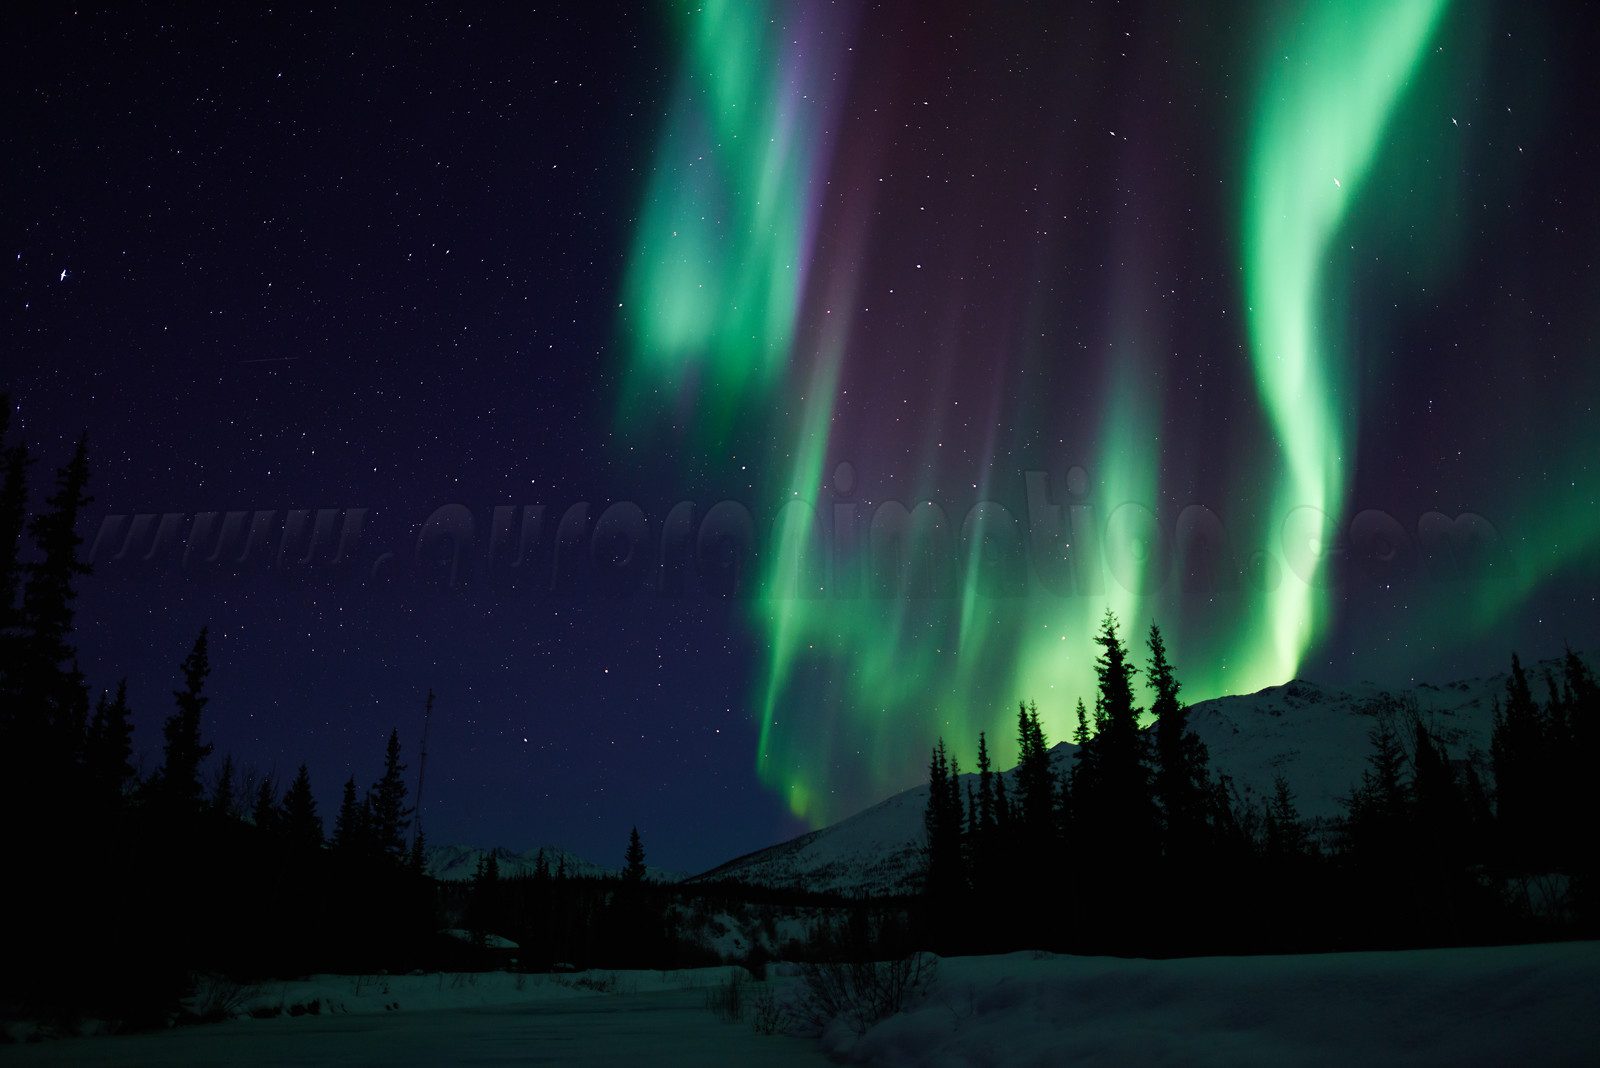 New Photo Gallery: Aurora Reflections - Wiseman, March 23 2015